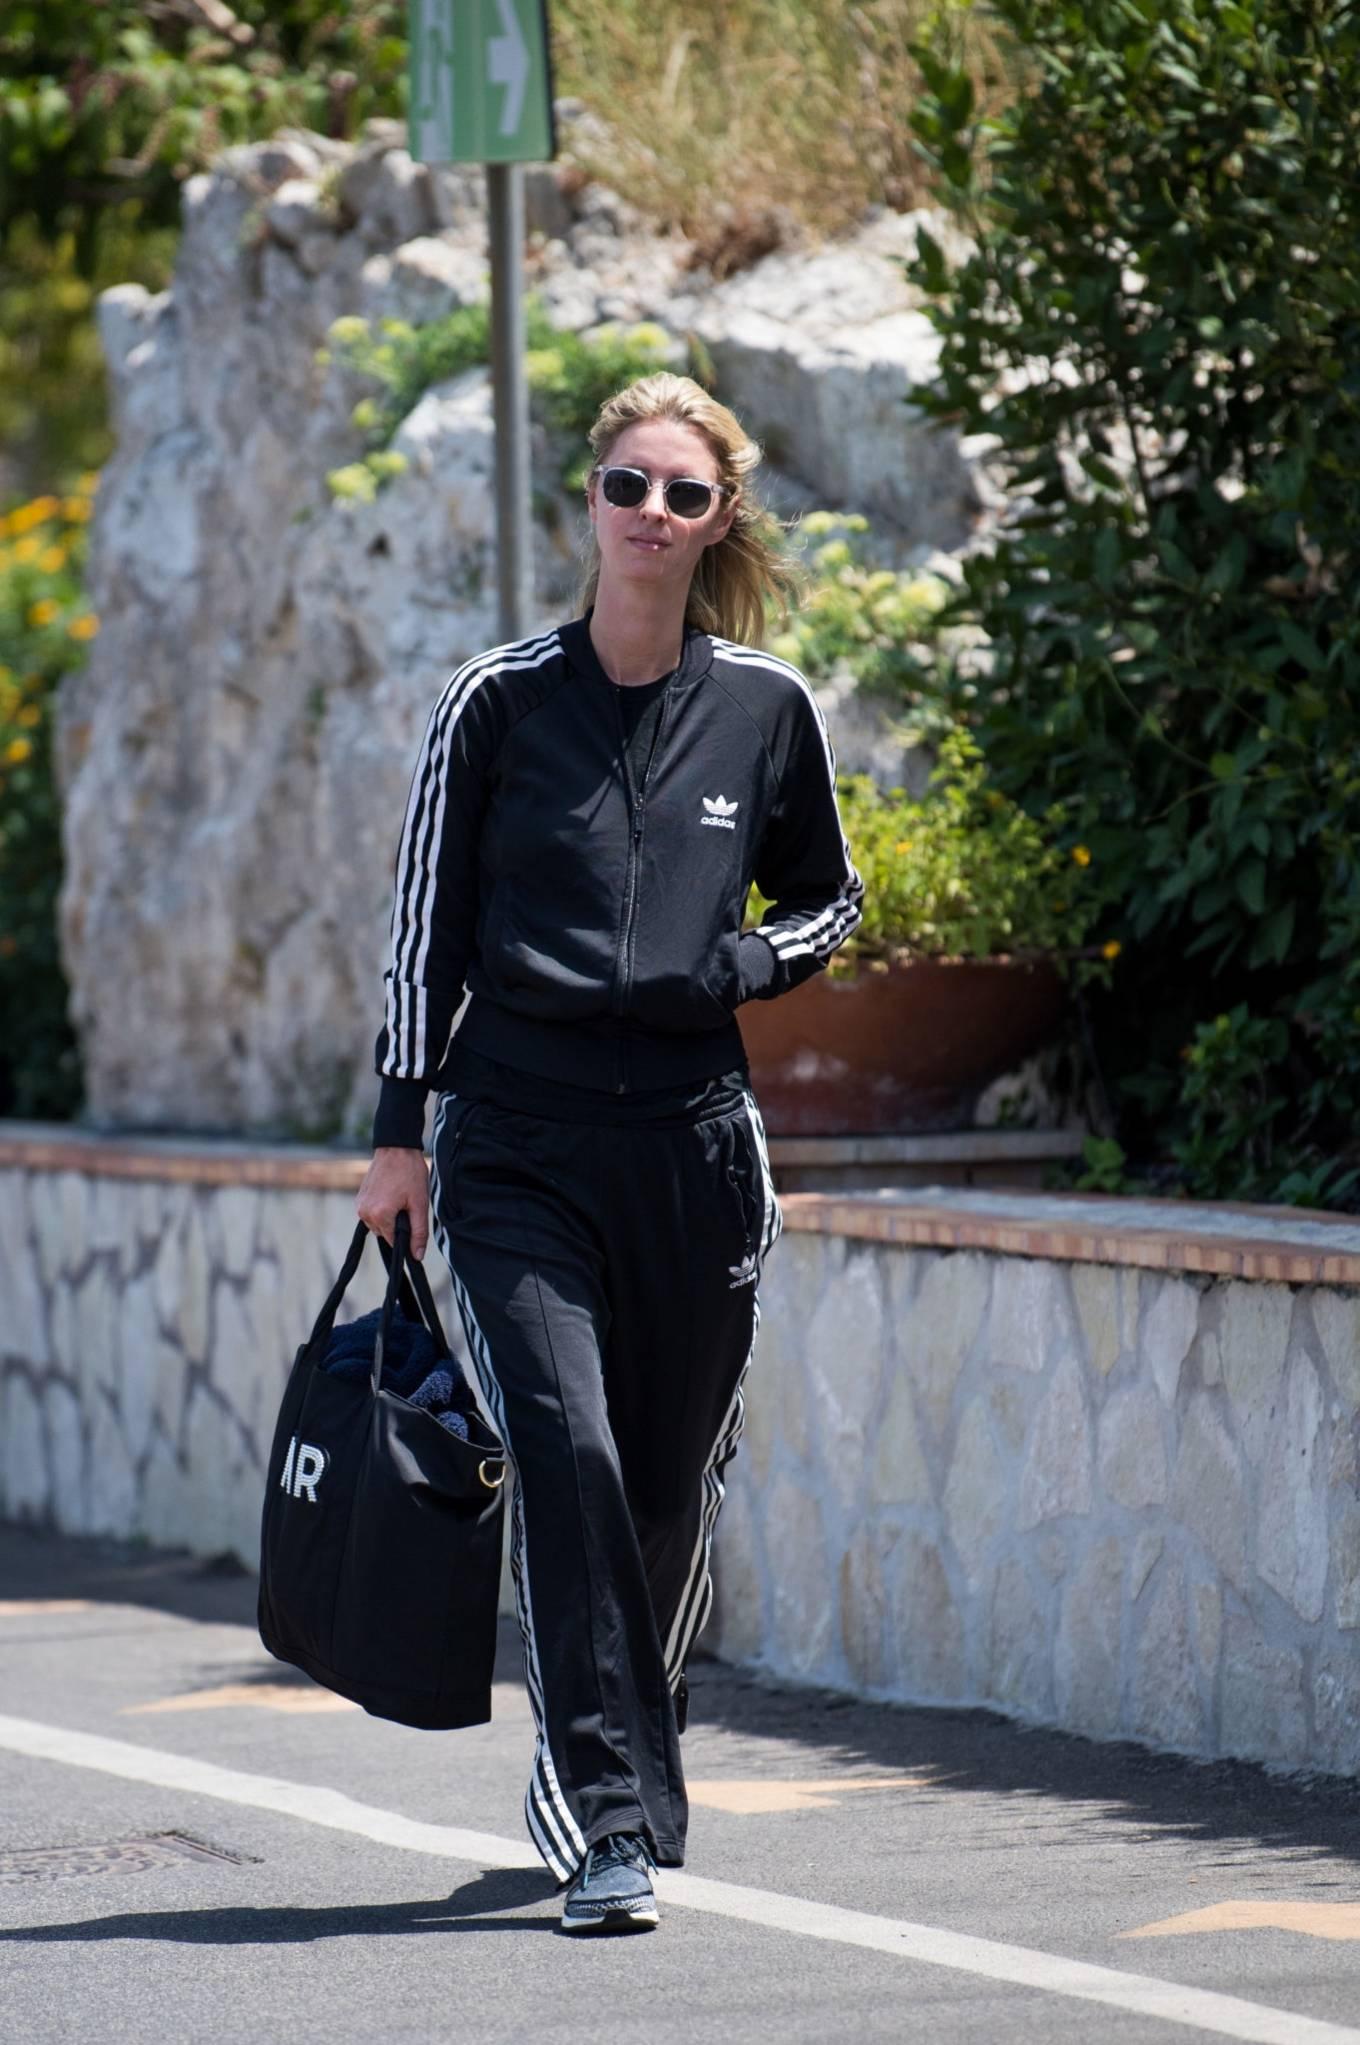 Nicky Hilton 2021 : Nicky Hilton – Seen in Capri ahead of the UNICEF italia and LuisaViaRoma summer gala -02